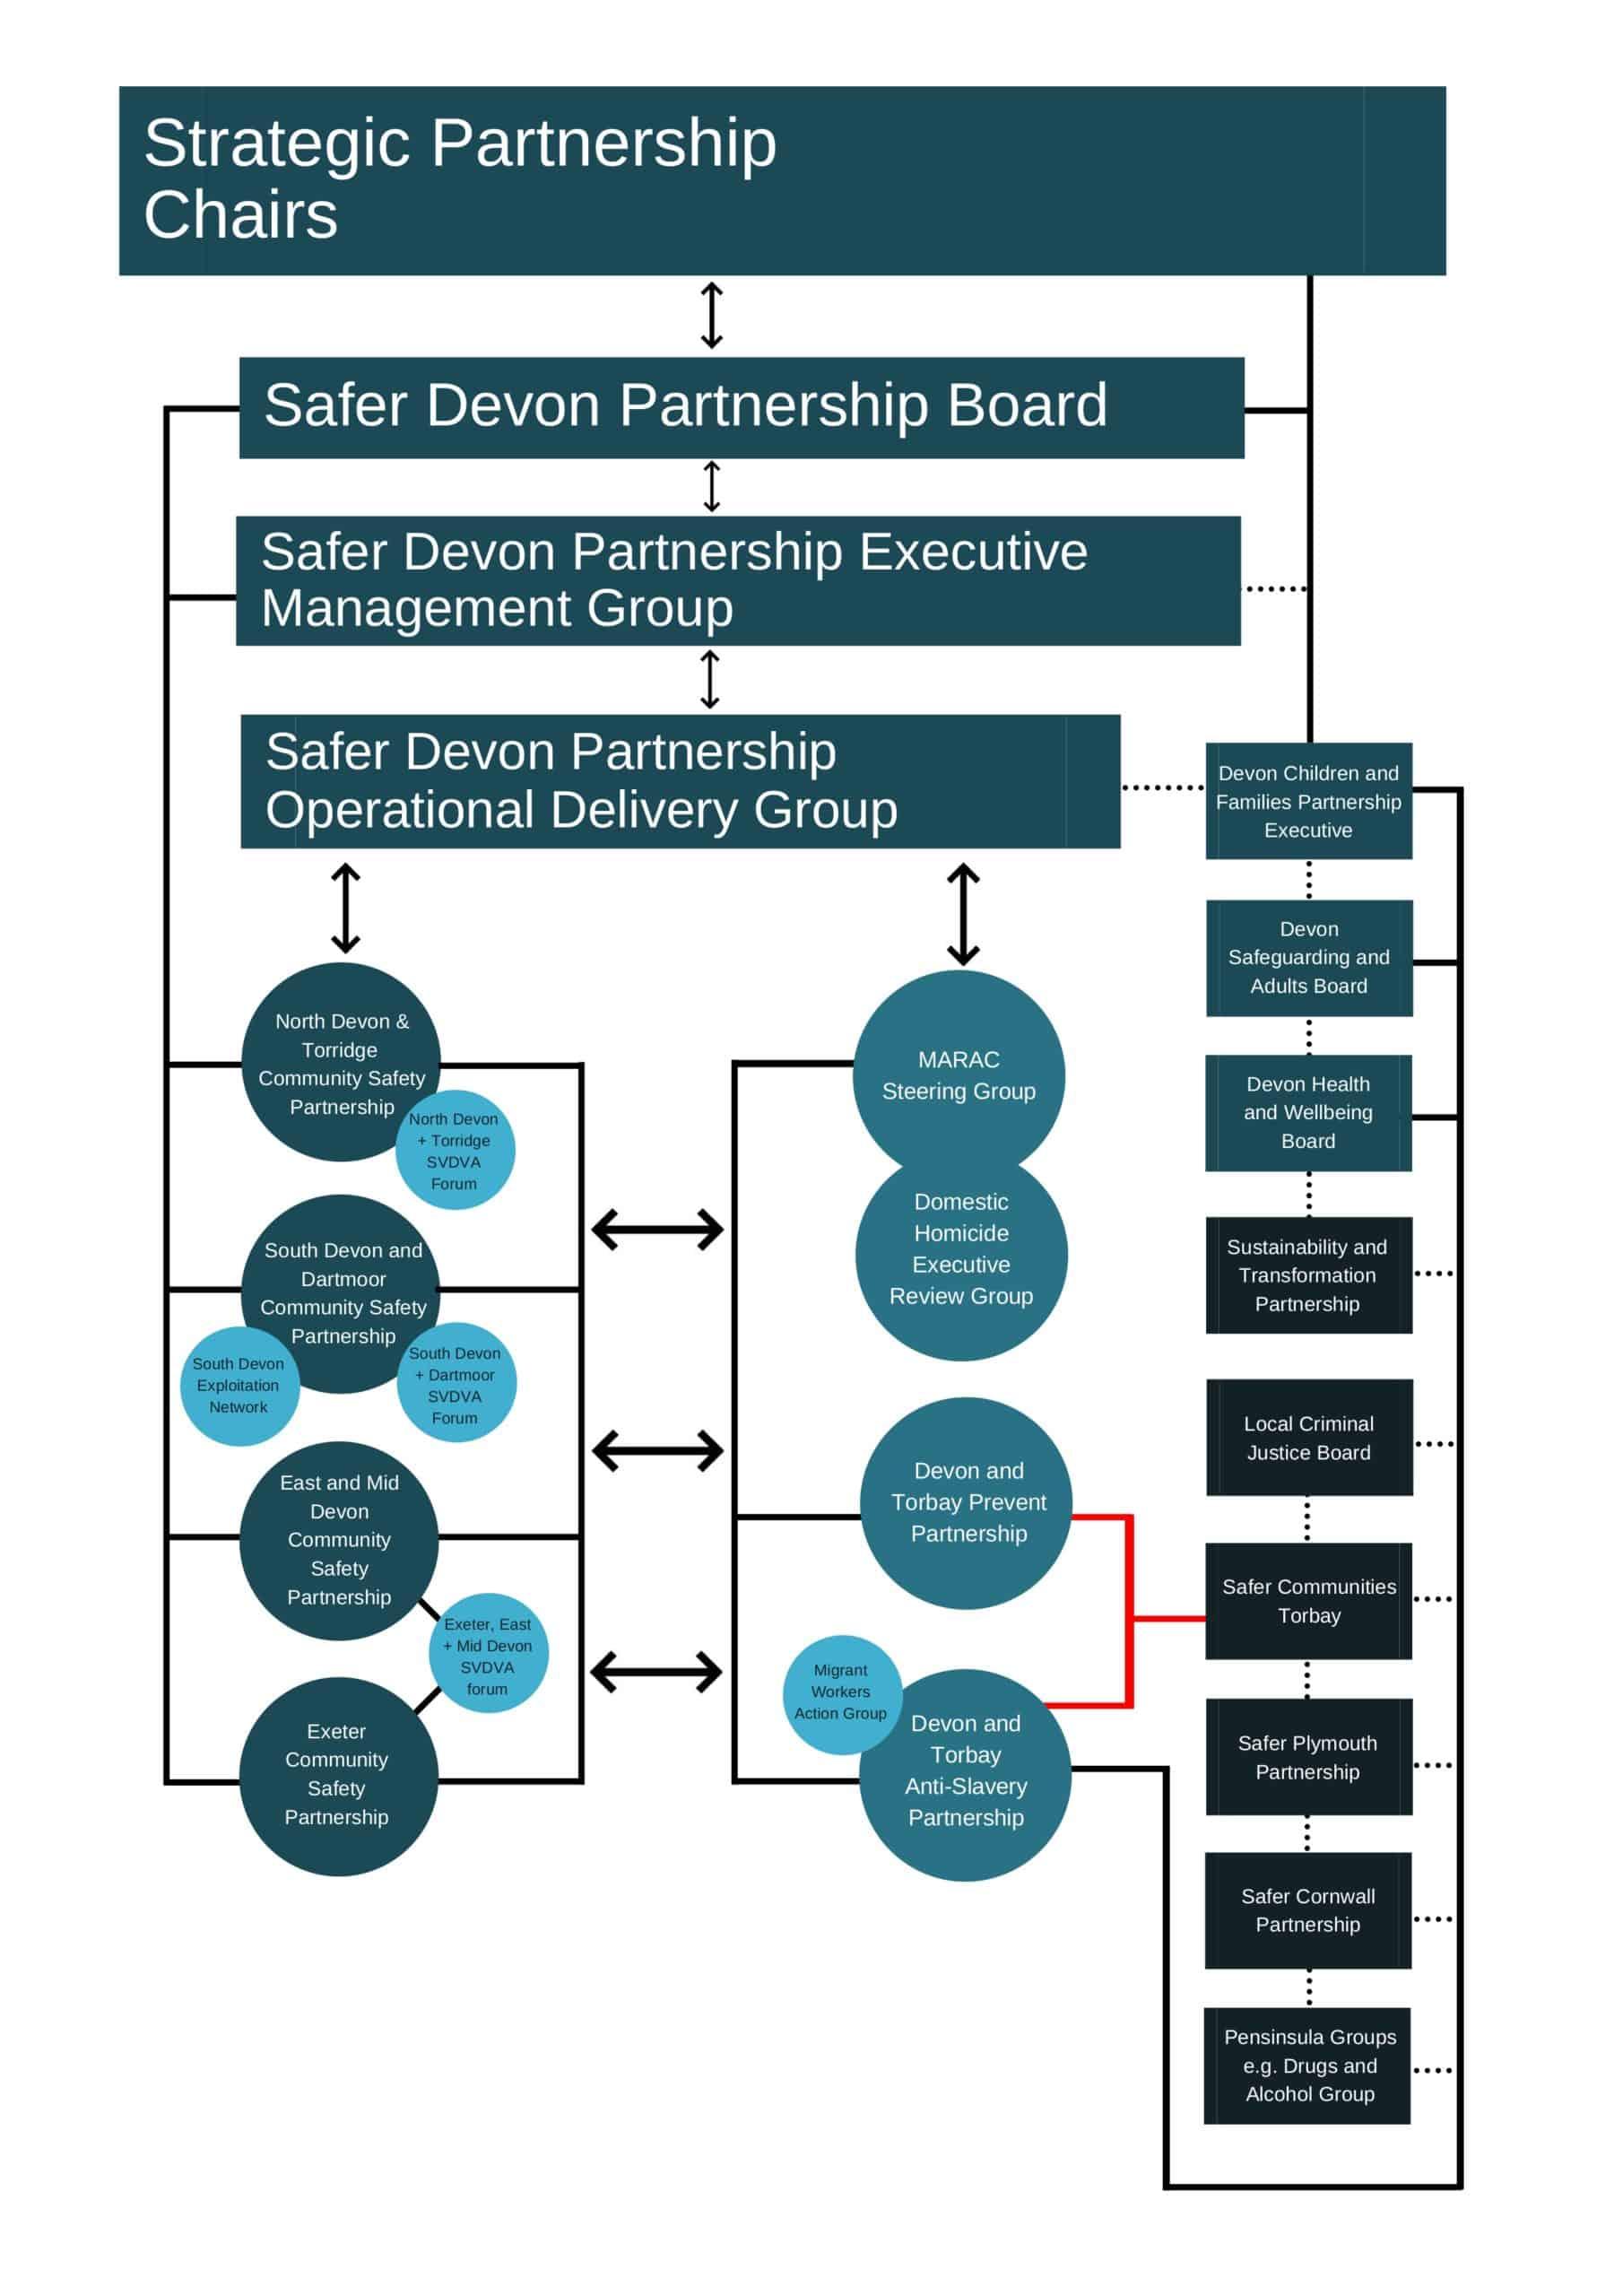 Safer Devon Governance Partners Groups